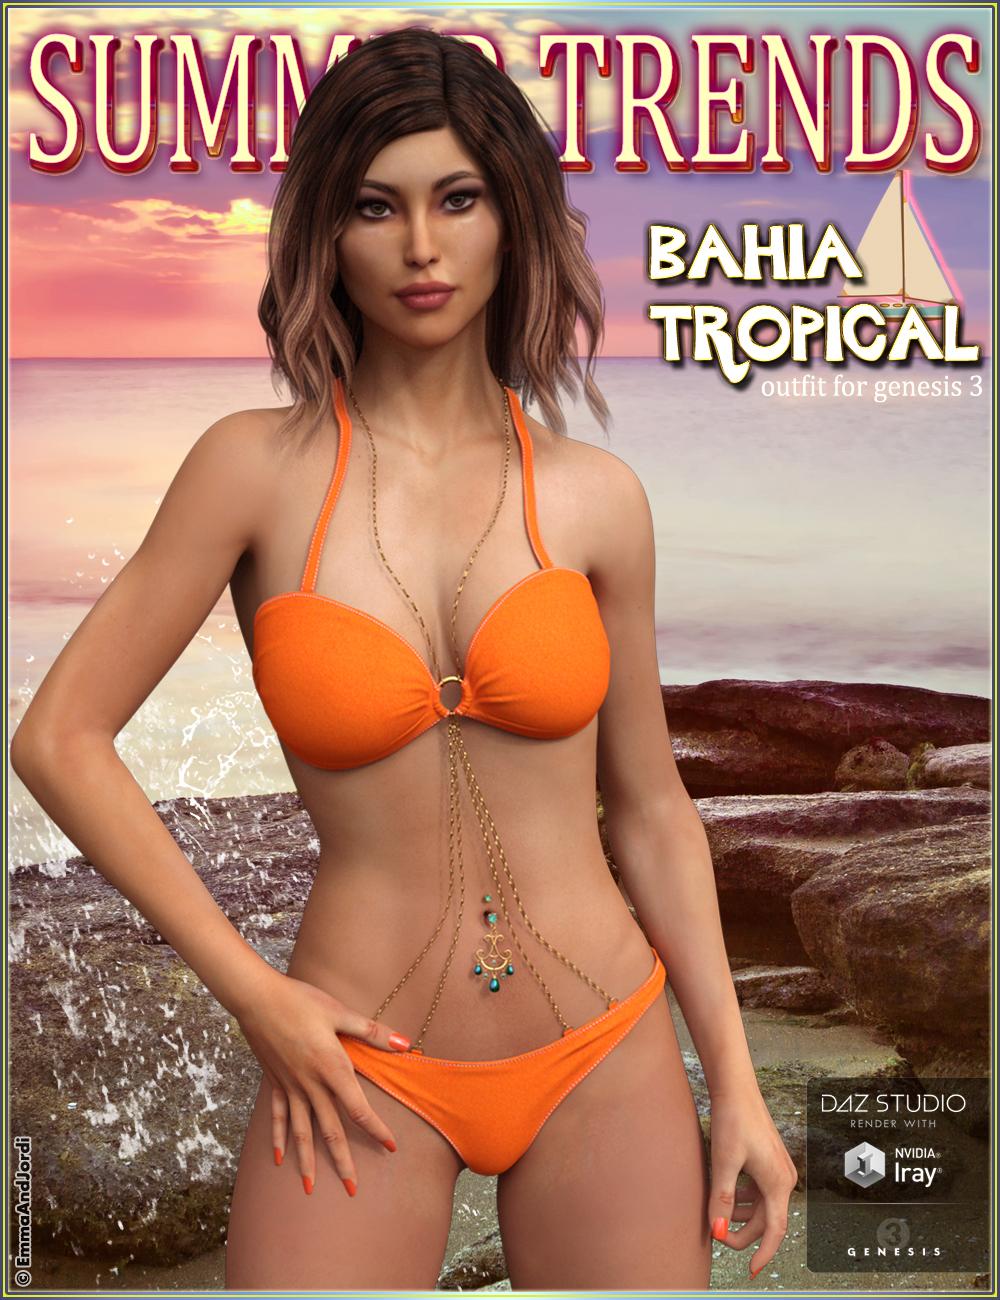 Bahia Tropical Outfit for Genesis 3 Female(s) by: EmmaAndJordi, 3D Models by Daz 3D